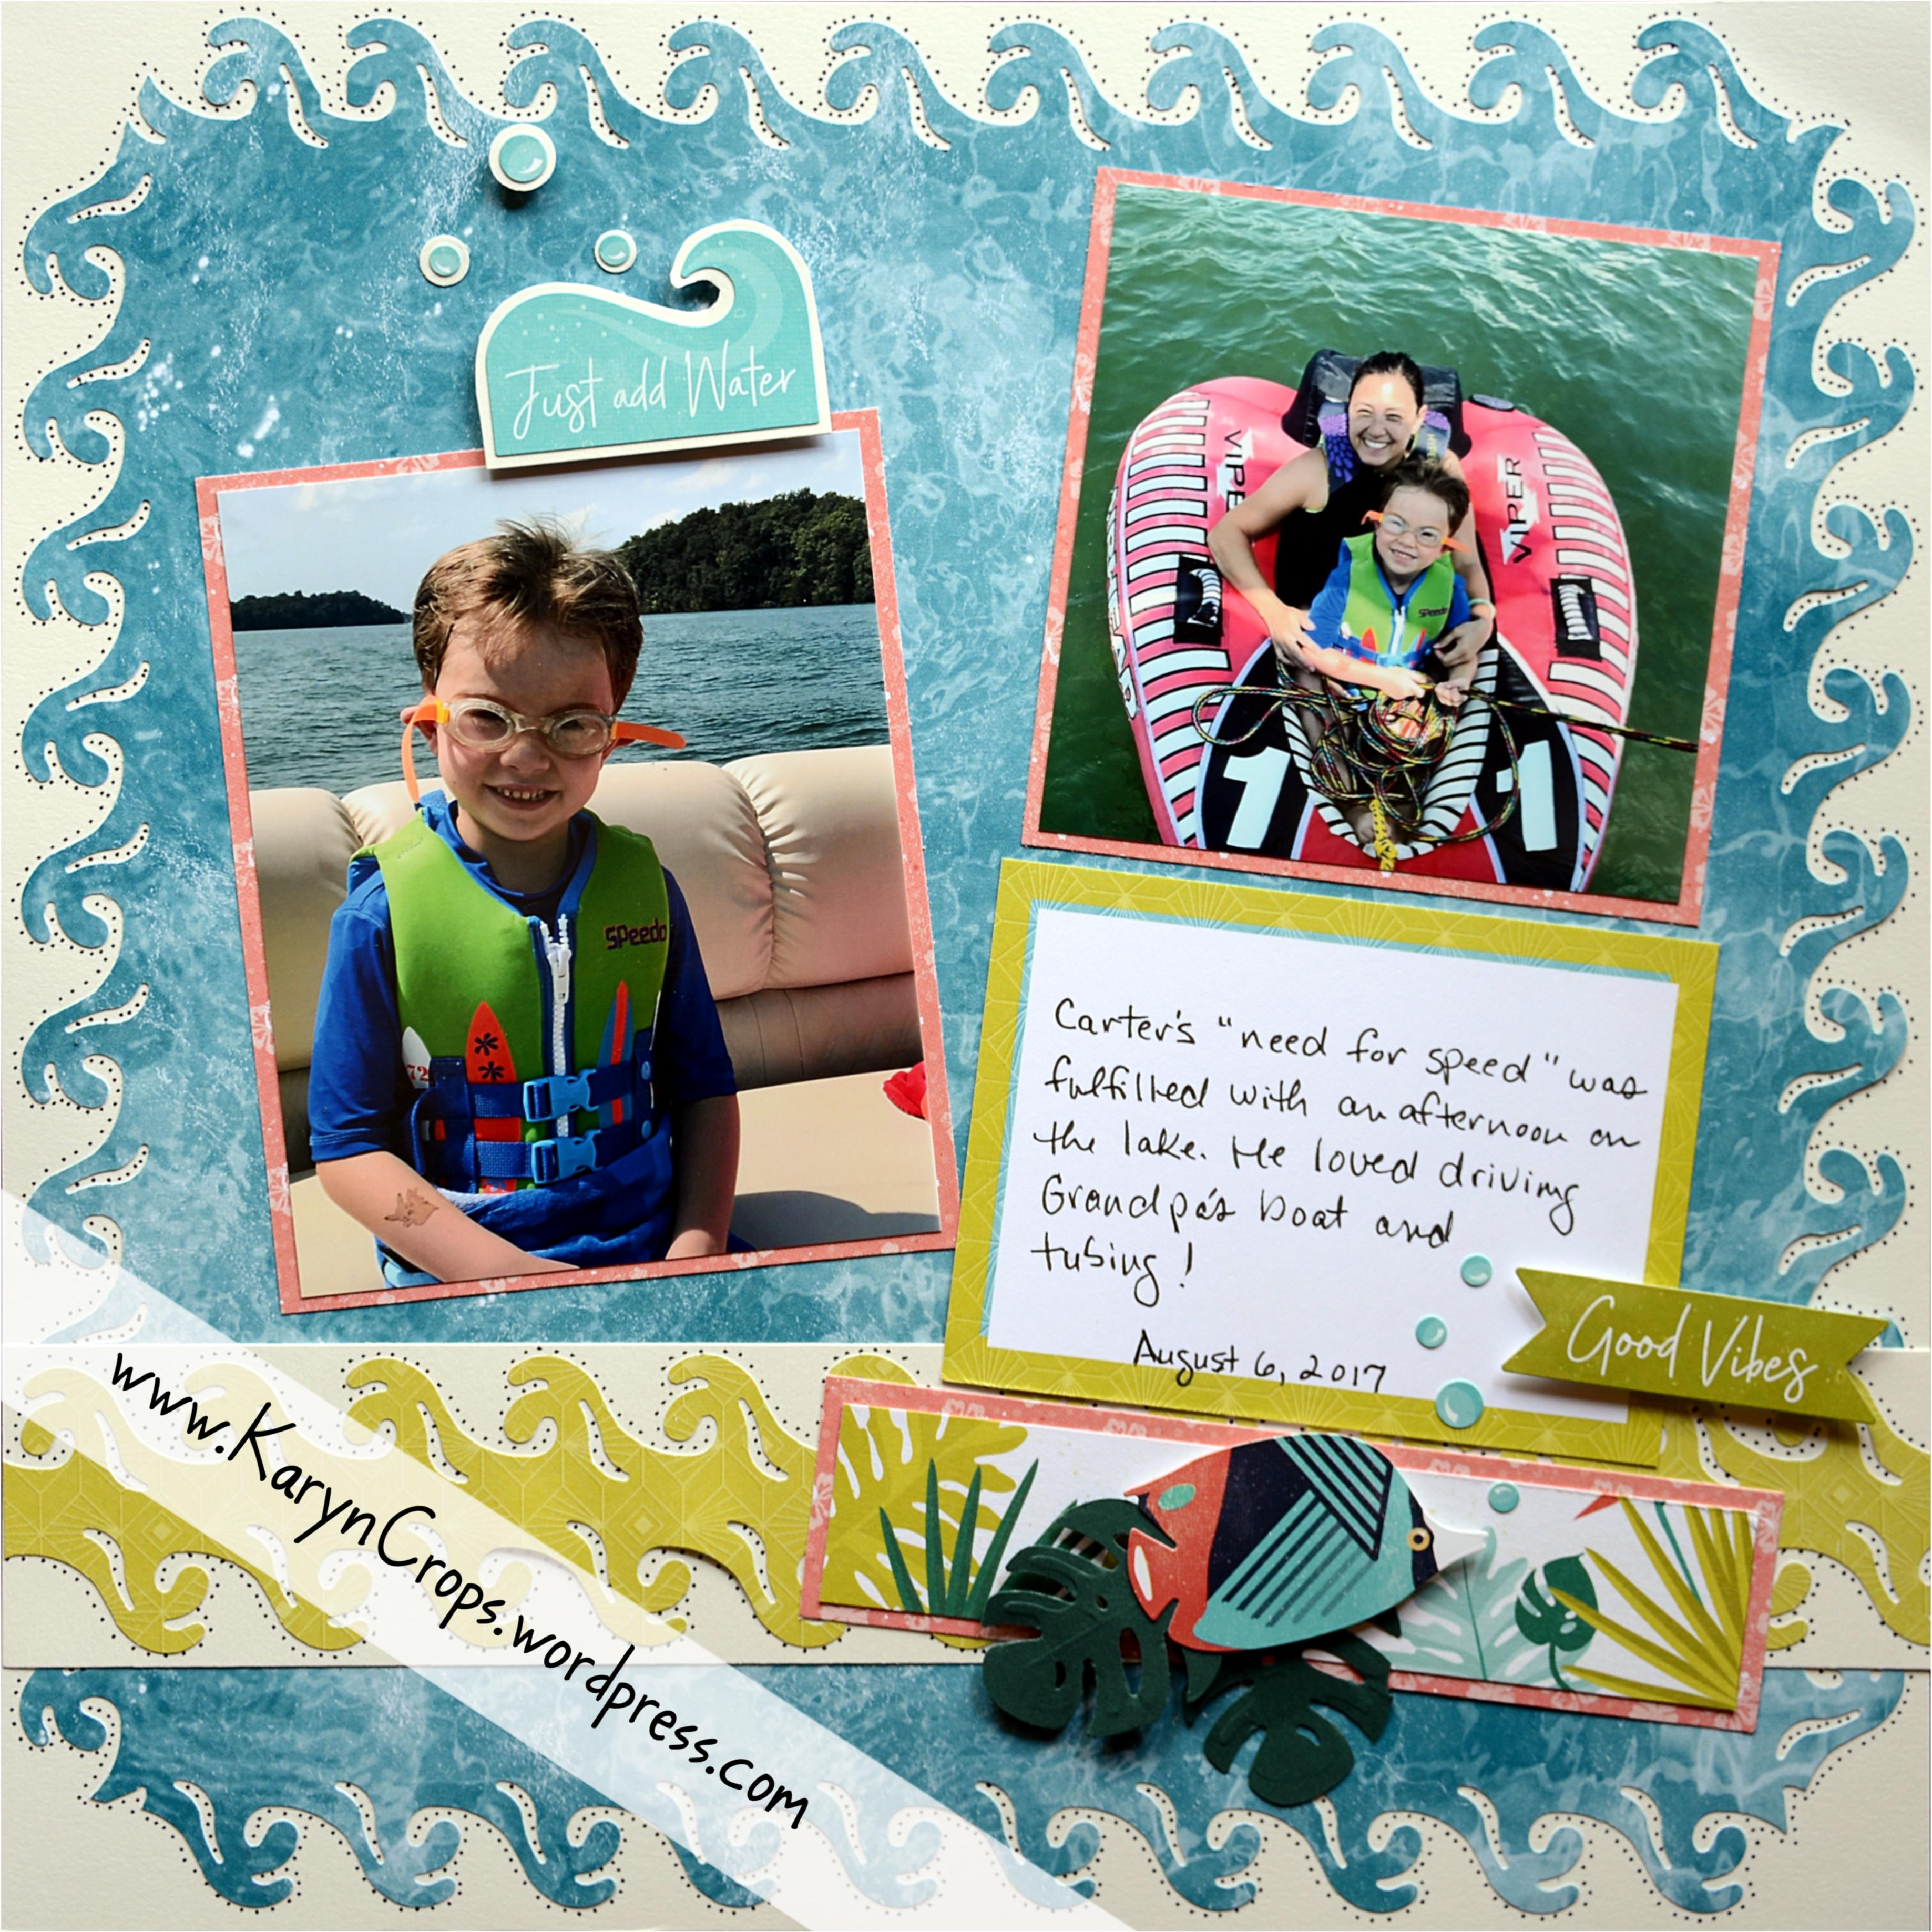 KarynCropsWordpressSunKissed3 - Page 086